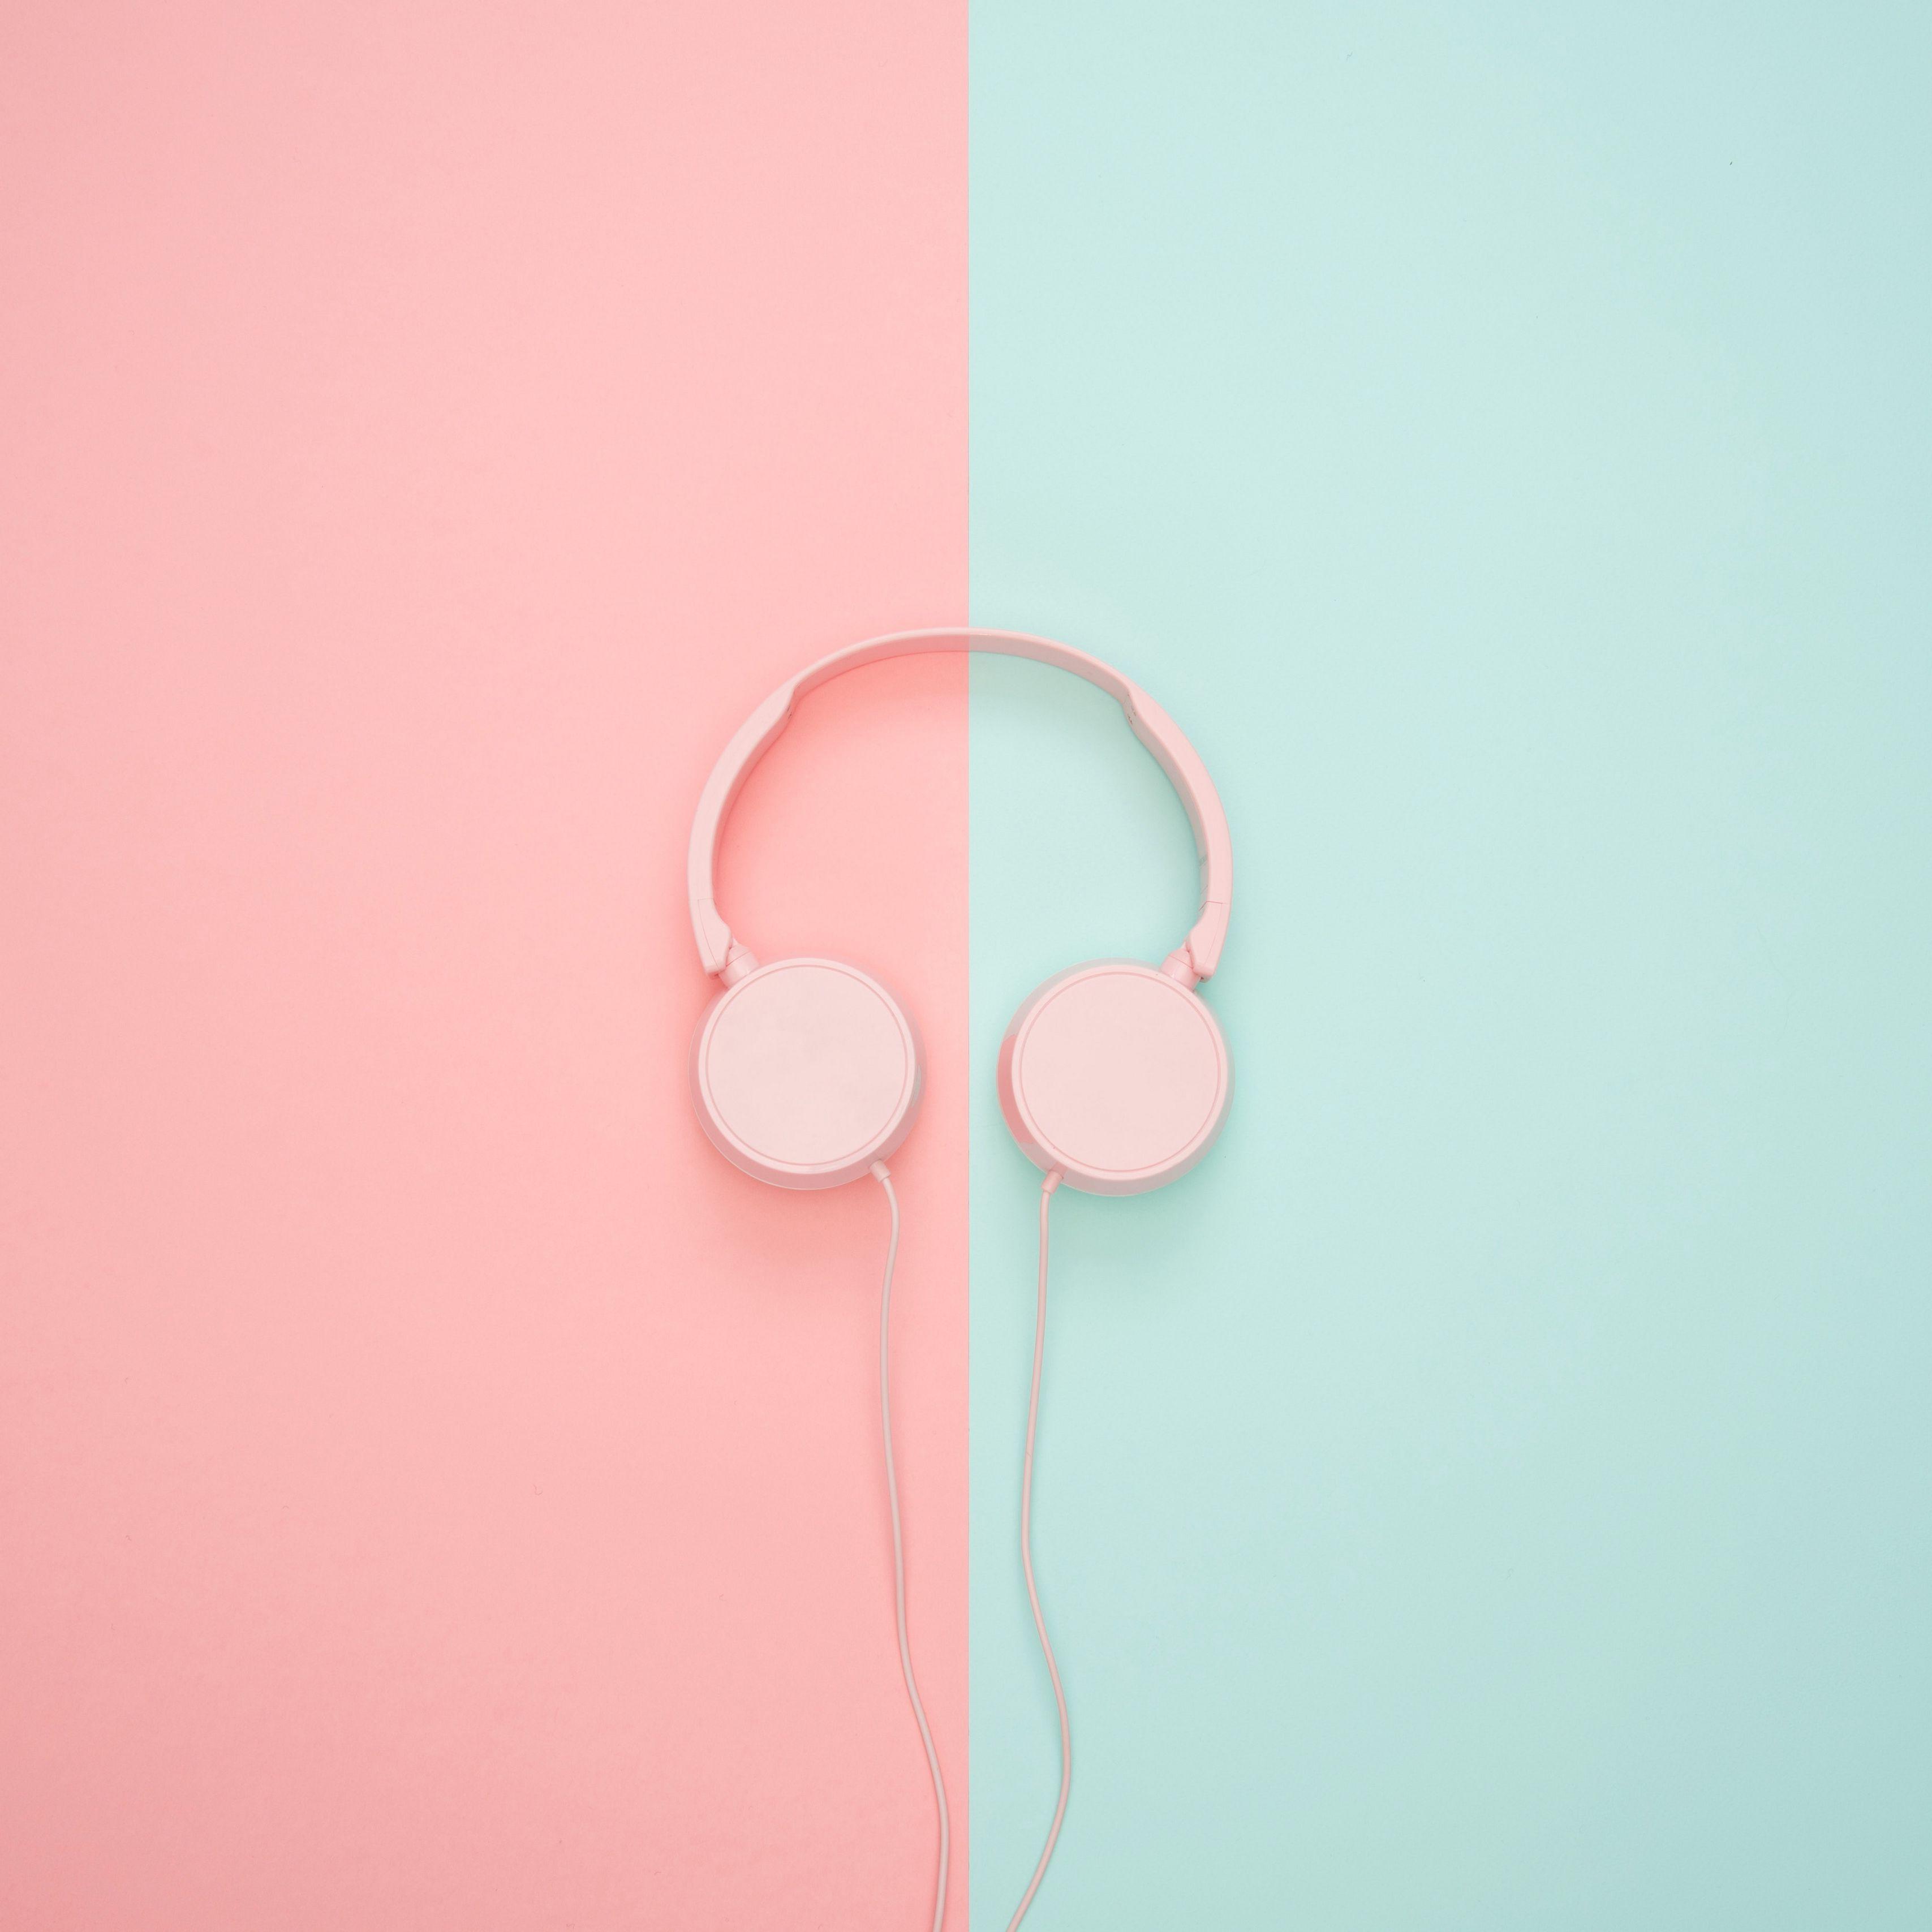 3415x3415 Wallpaper headphones, minimalism, pink, pastel